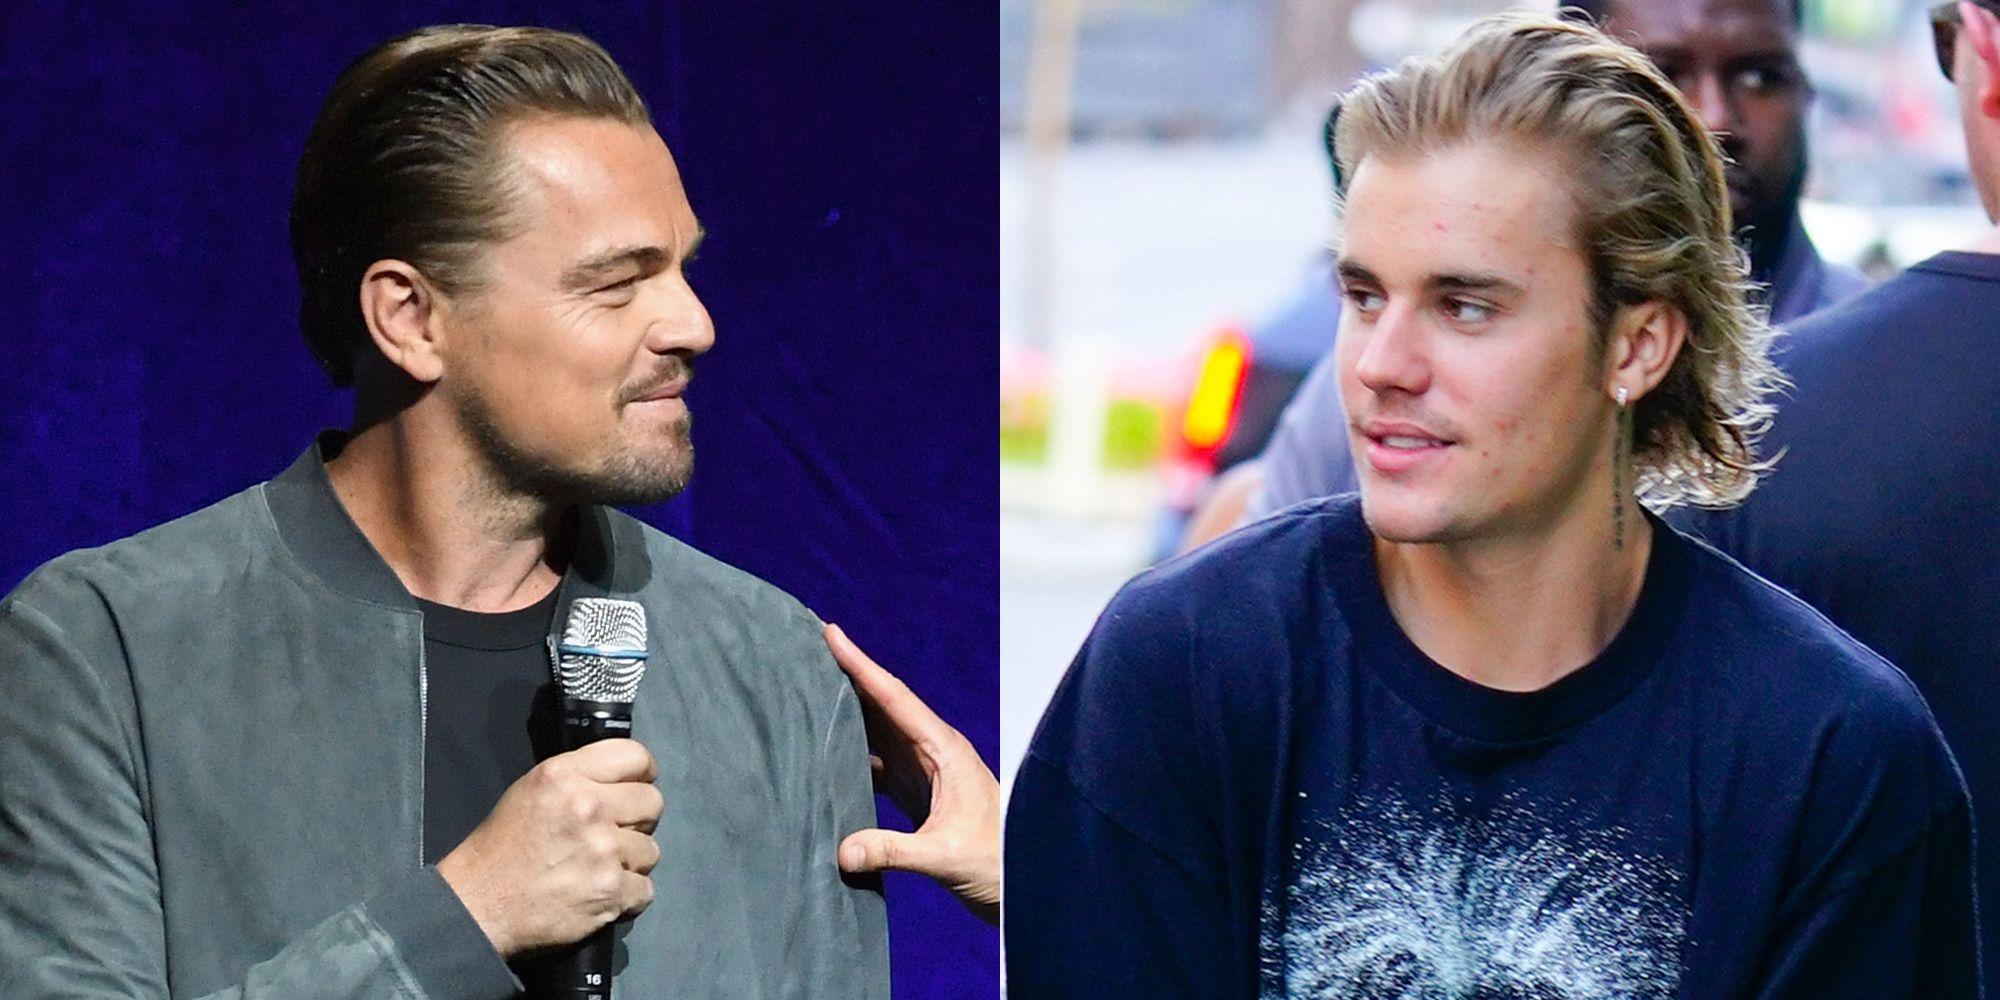 hawaiishirtLeonardo DiCaprioJustin Bieber